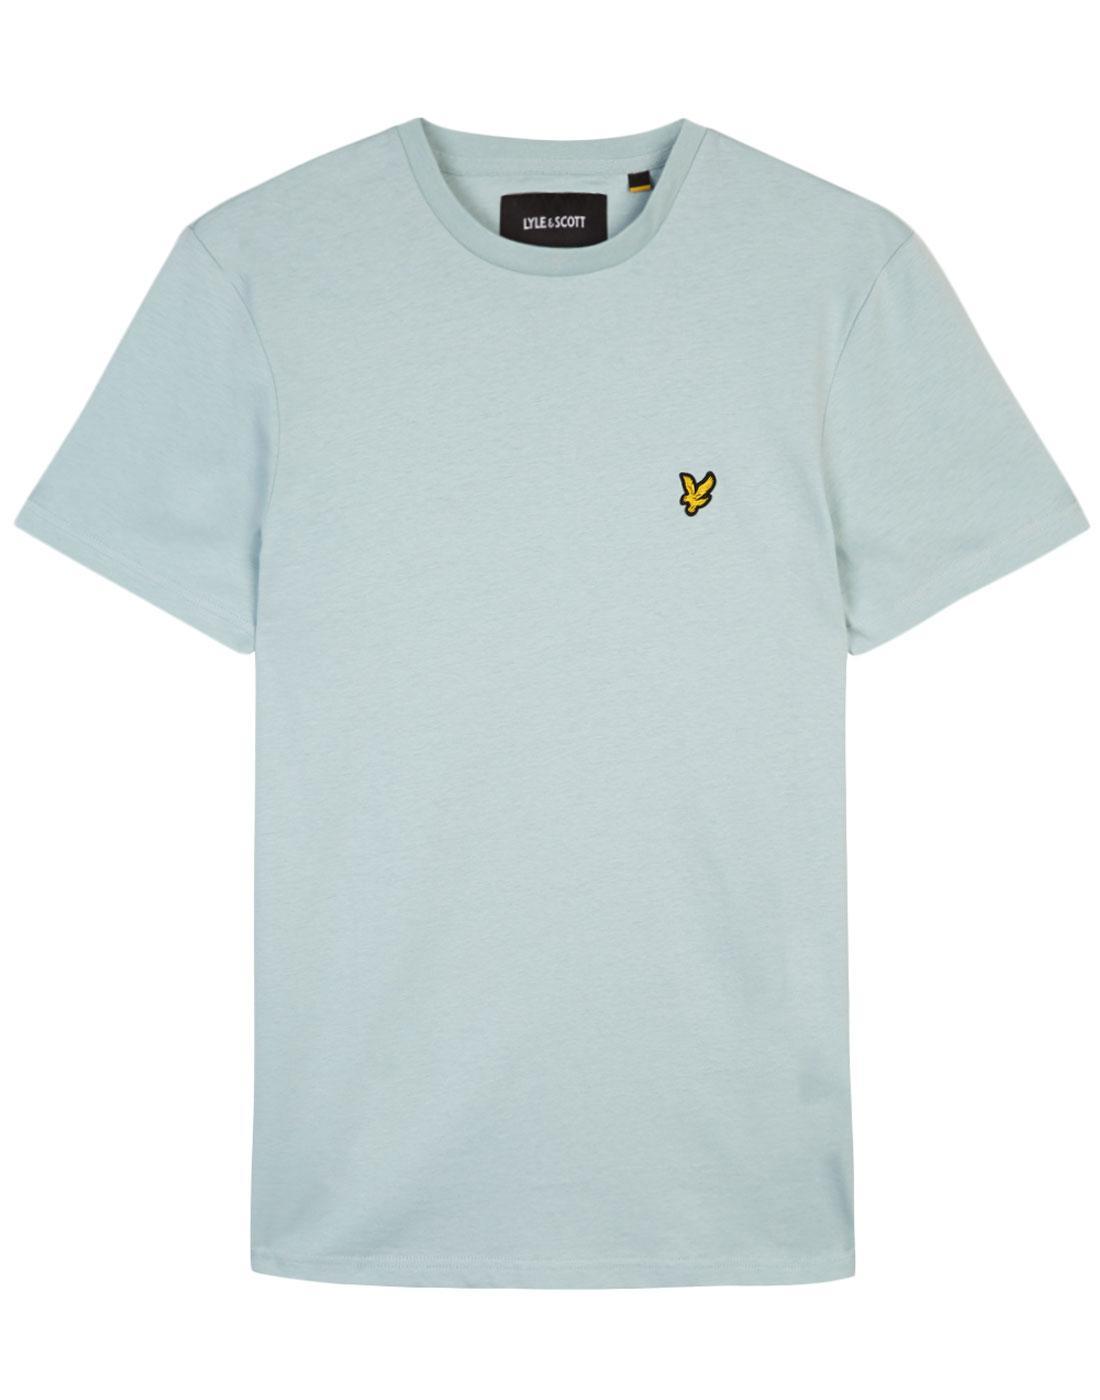 LYLE & SCOTT Retro Crew Neck T-Shirt (Powder Blue)